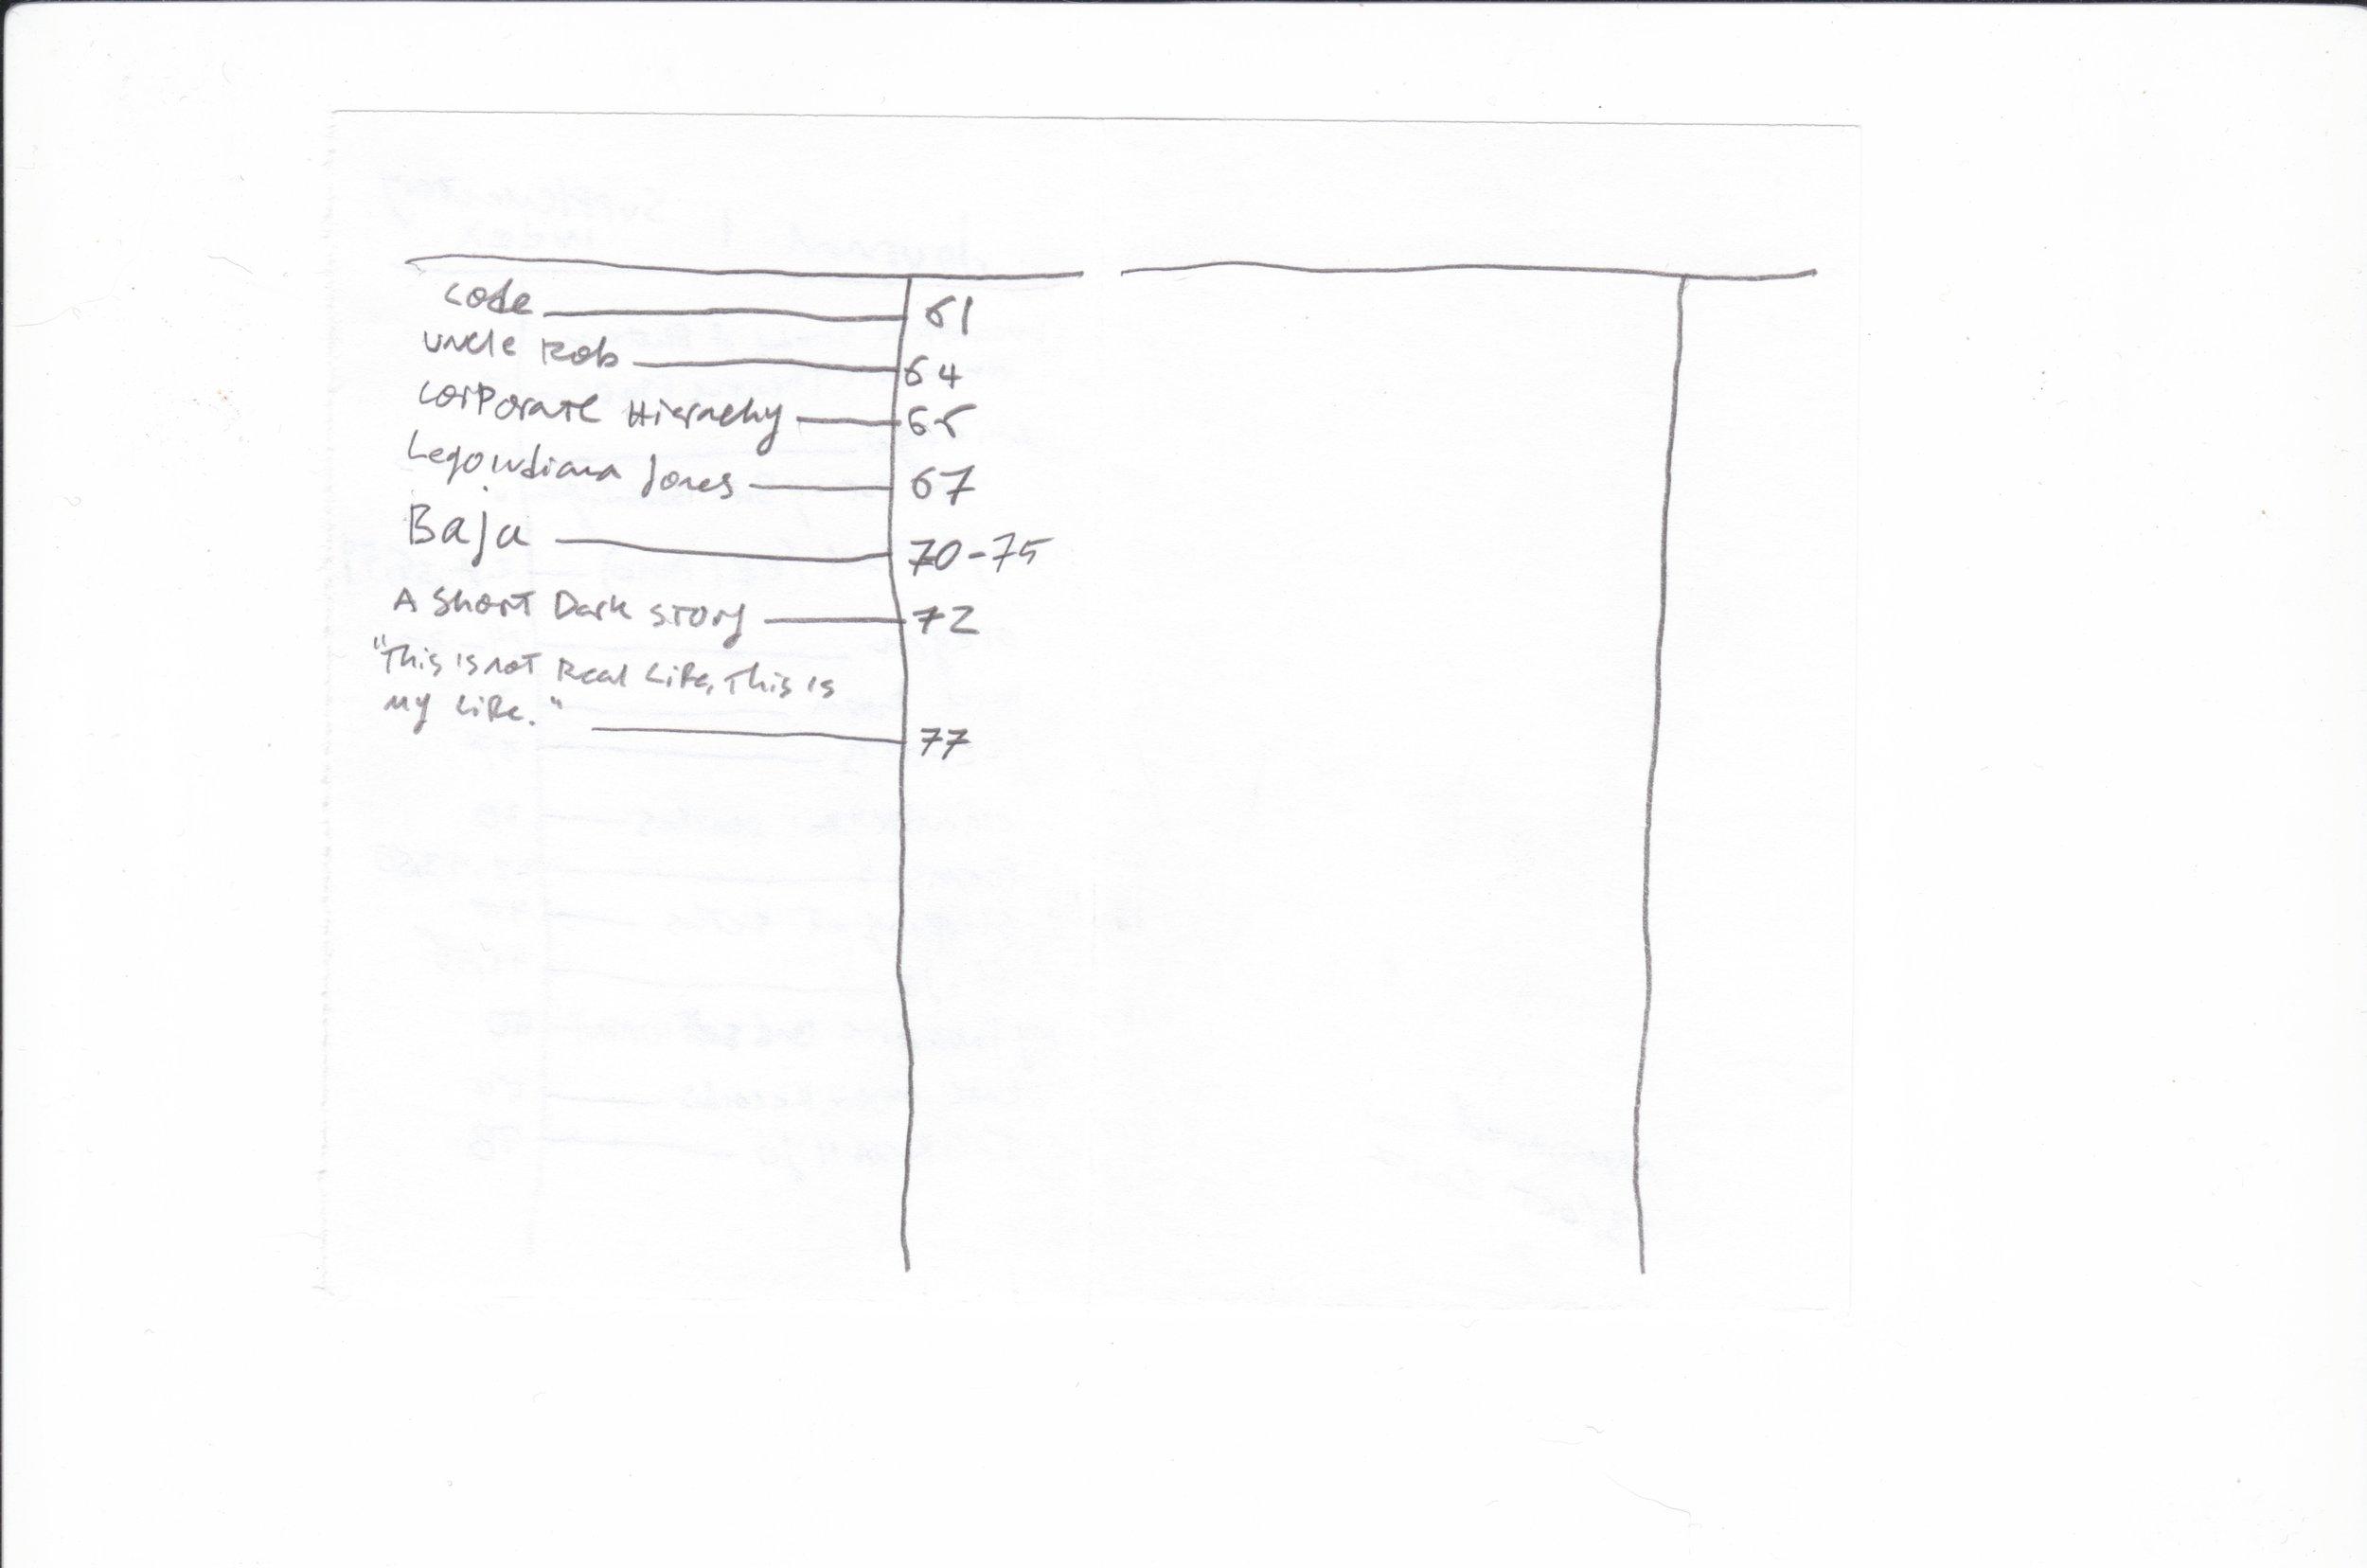 notebook1-index_Page_2.jpg